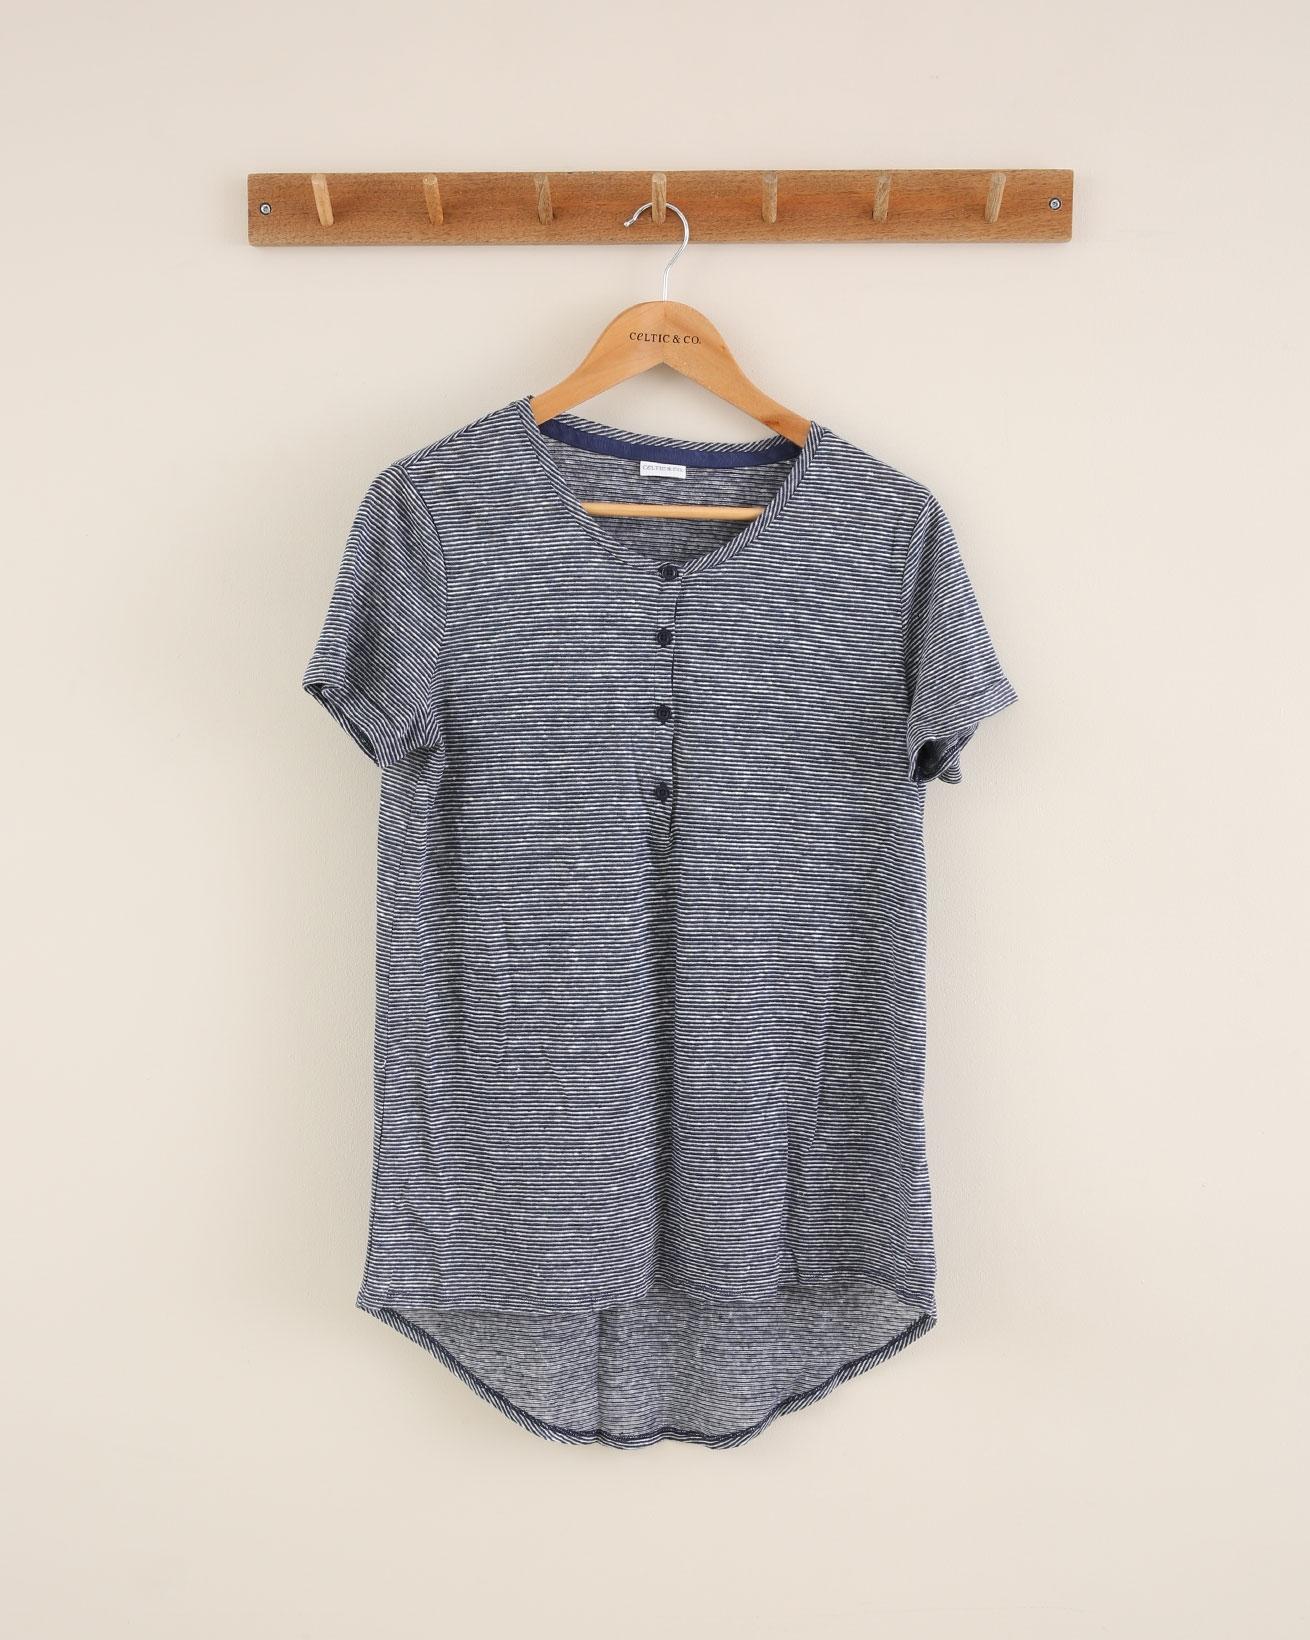 Linen Short Sleeve Henley Top - Size 8 - Blue Microstripe - 1706